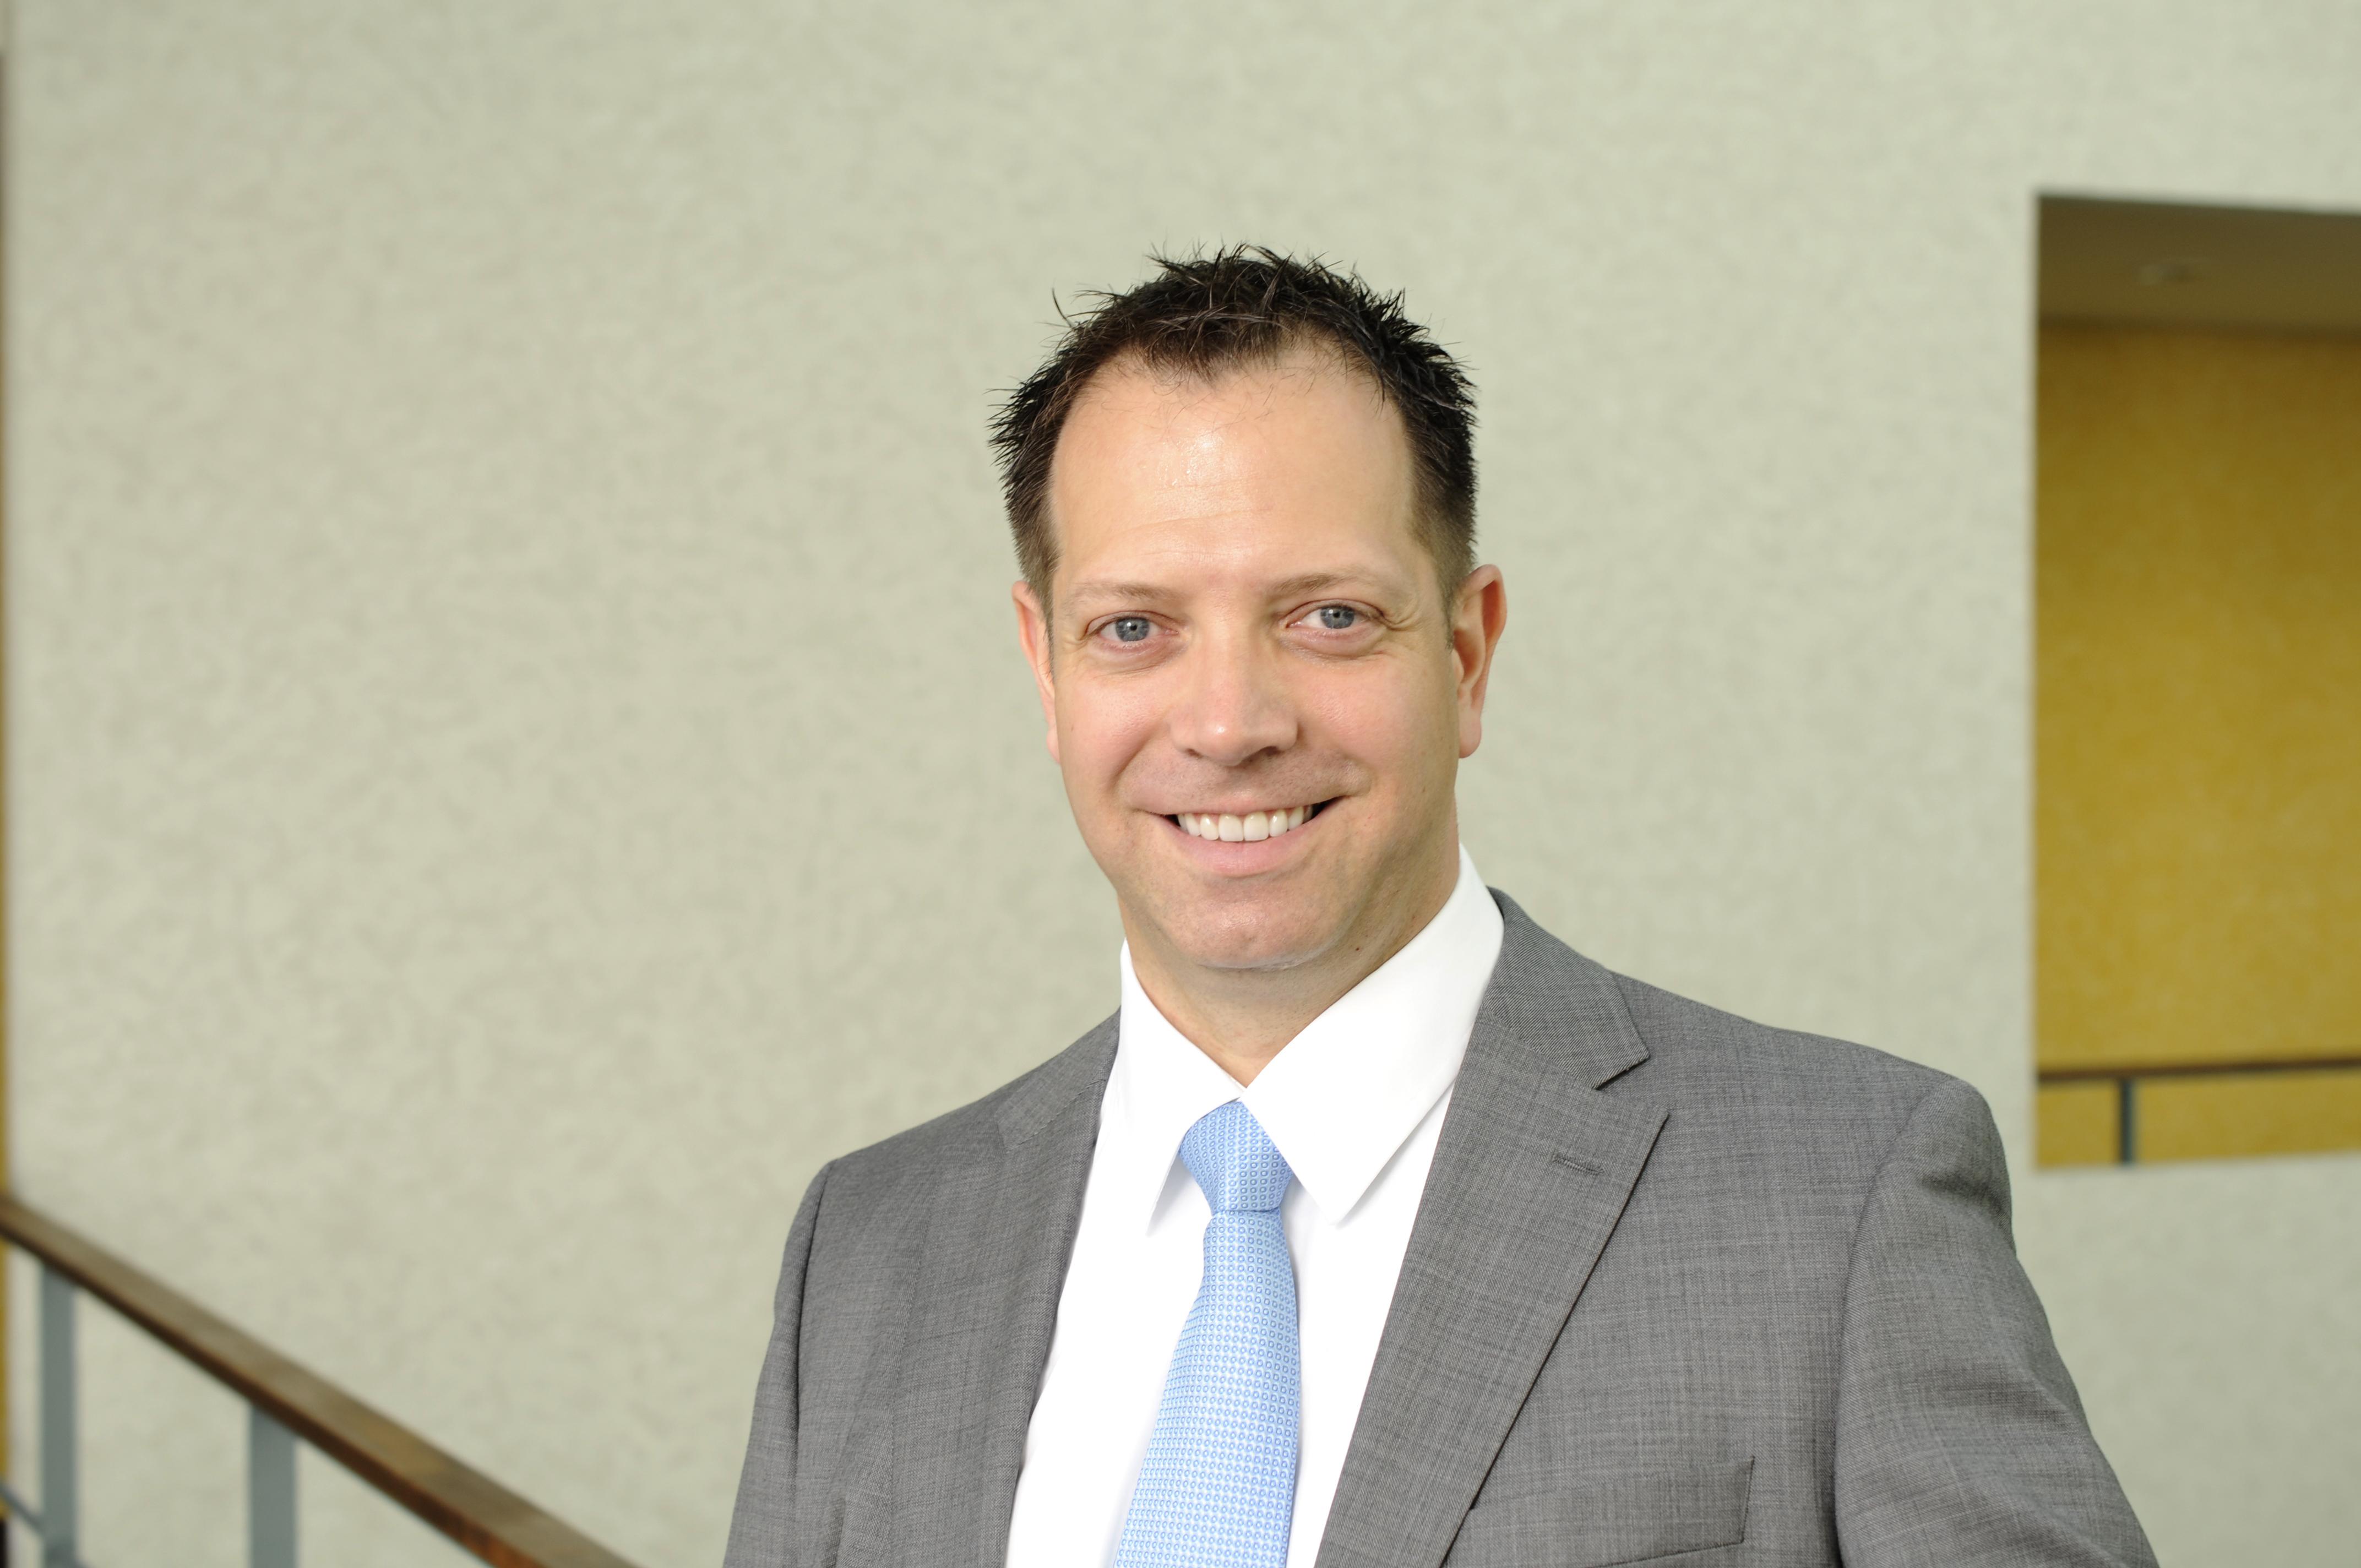 Jörg Schneider-Simon, Autor des Artikels über E-Government